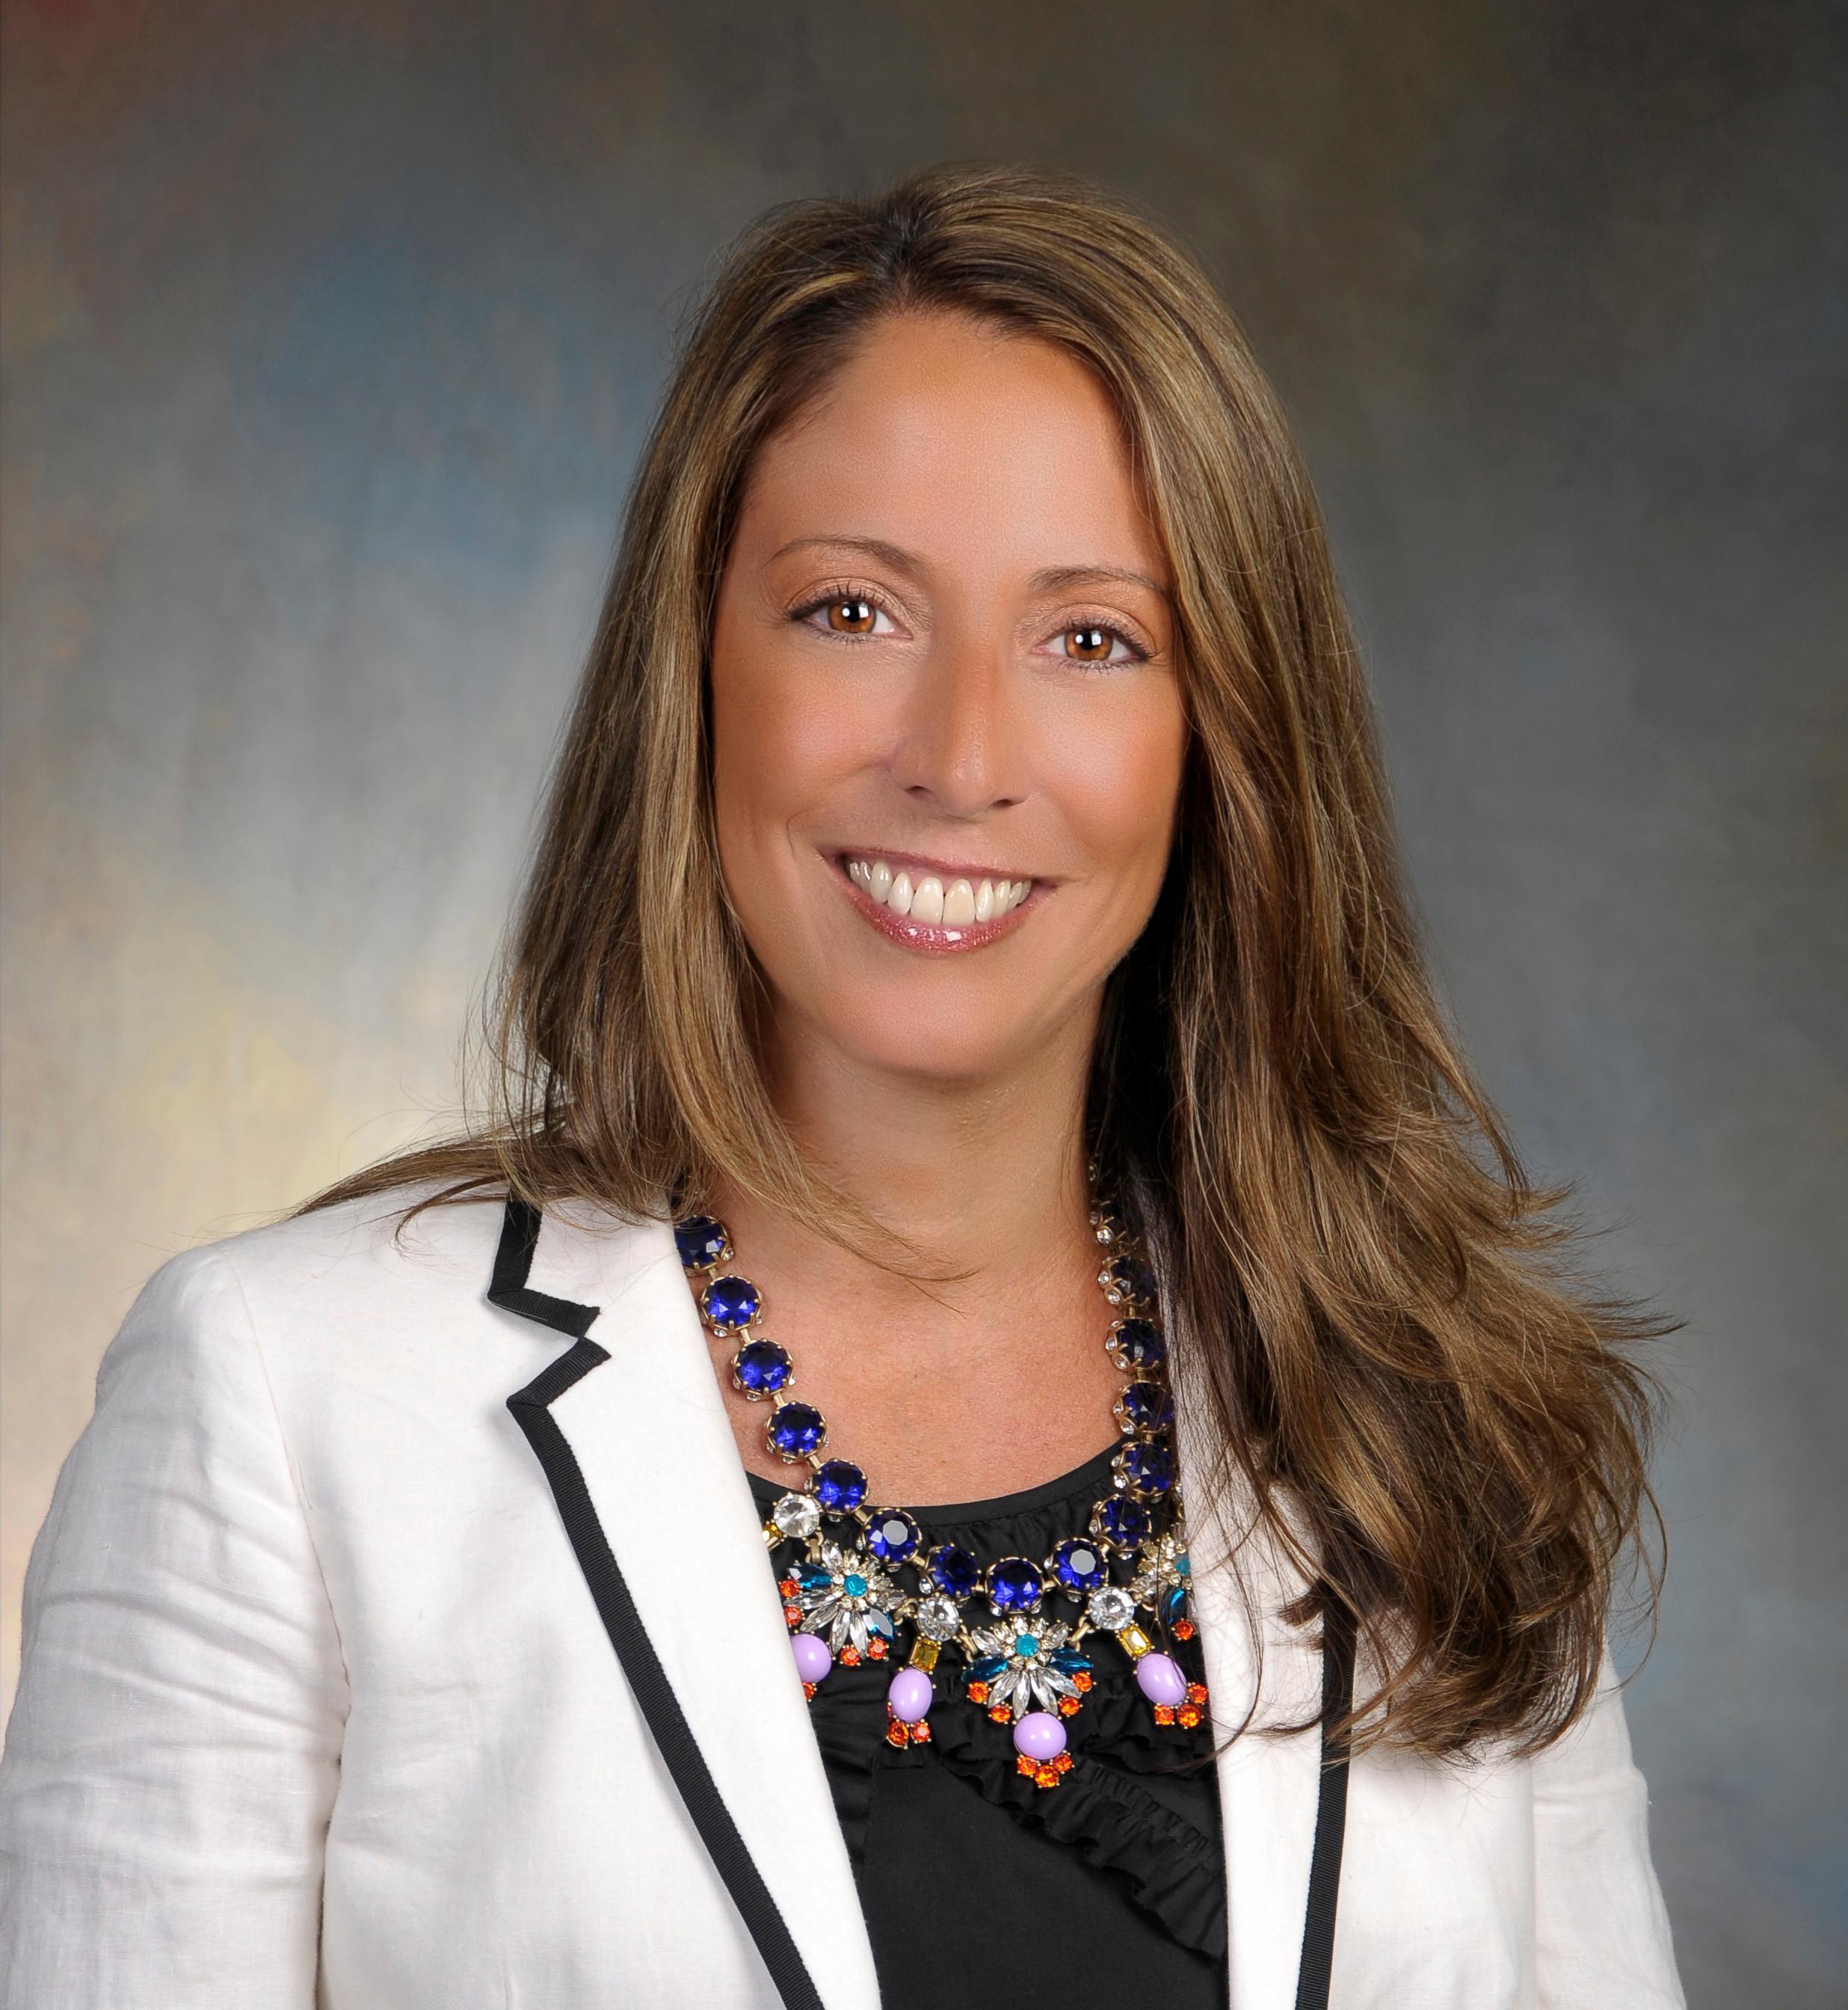 Lisa Hayes, MD